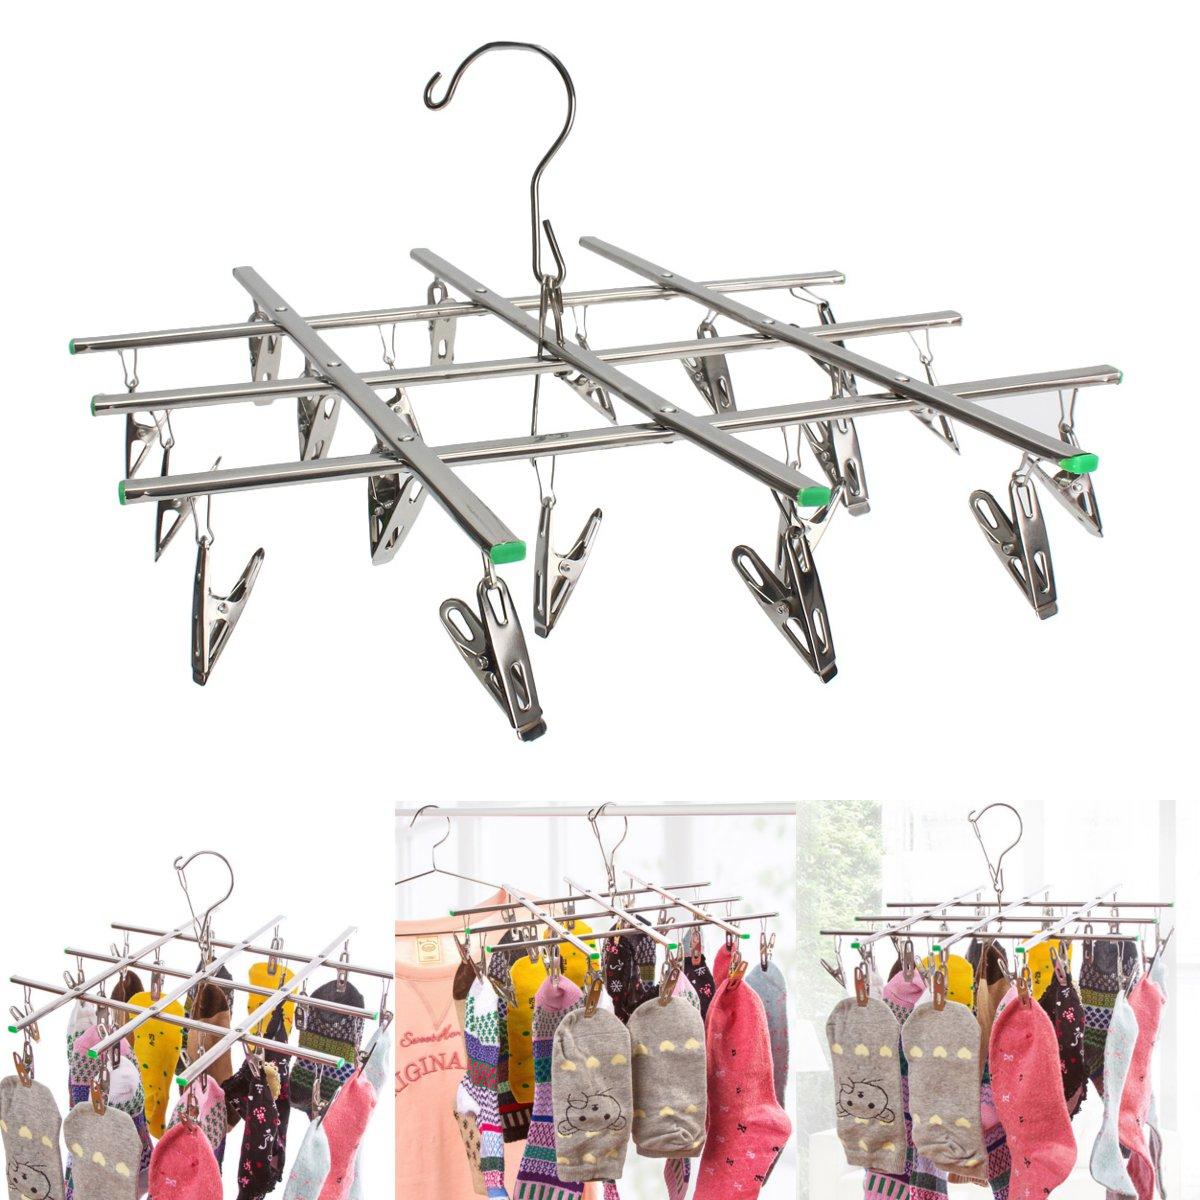 20 Pegs Laundry Clamp Swivel Hook Stainless Steel Socks Underwear Bra Drying Rack Hanging Clothes Hanger